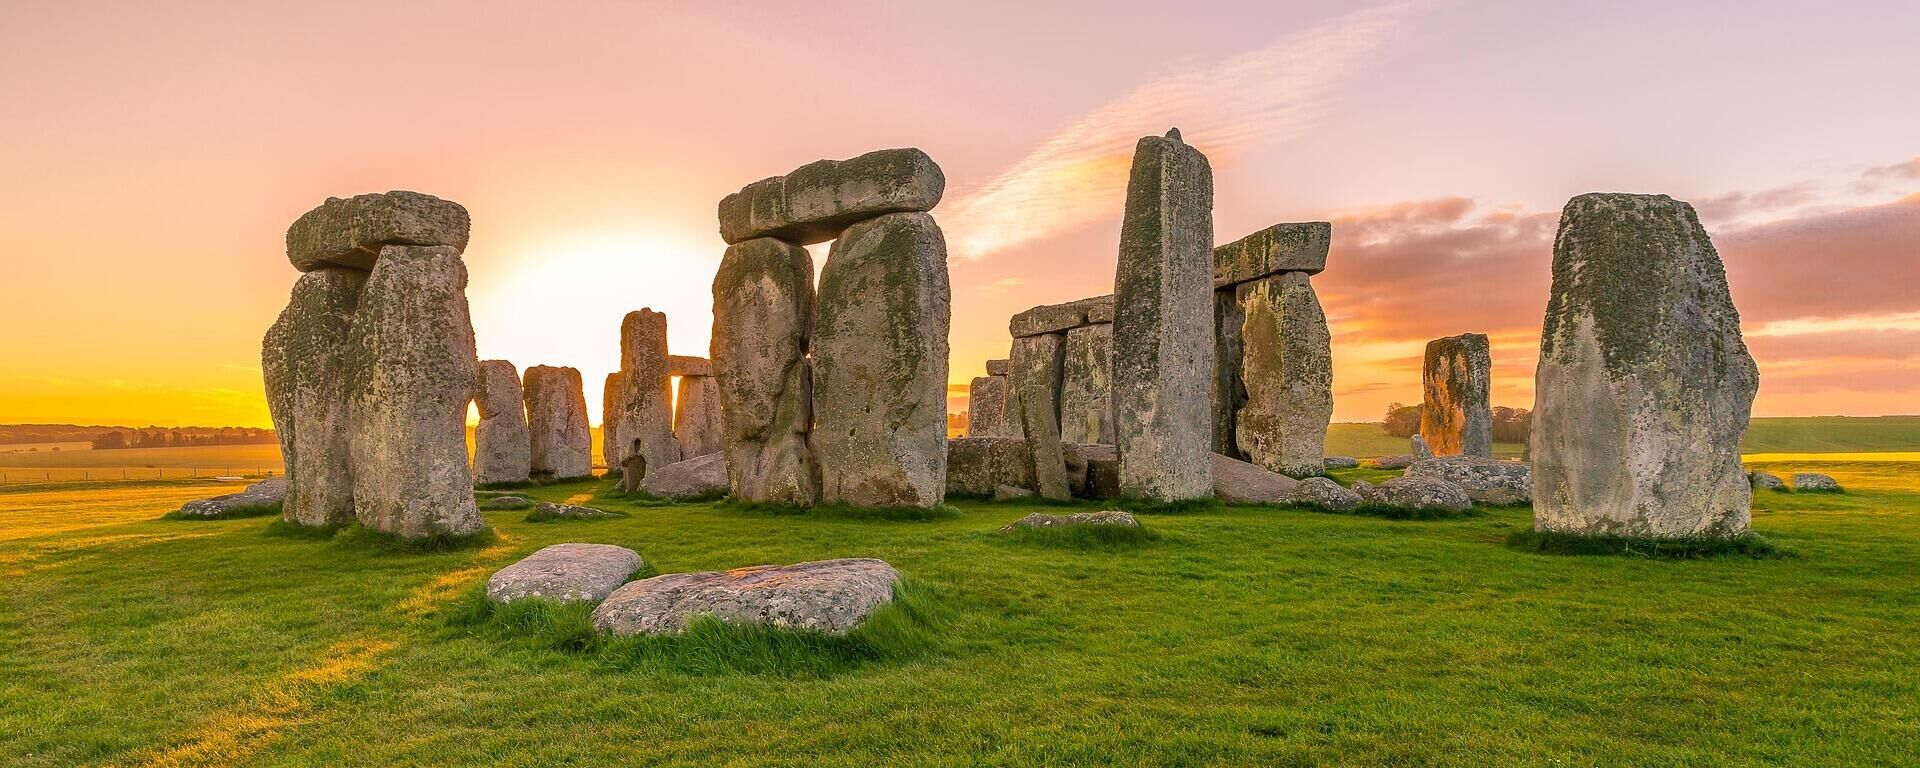 Stonehenge (Symbolbild) - SNA, 1920, 06.07.2021